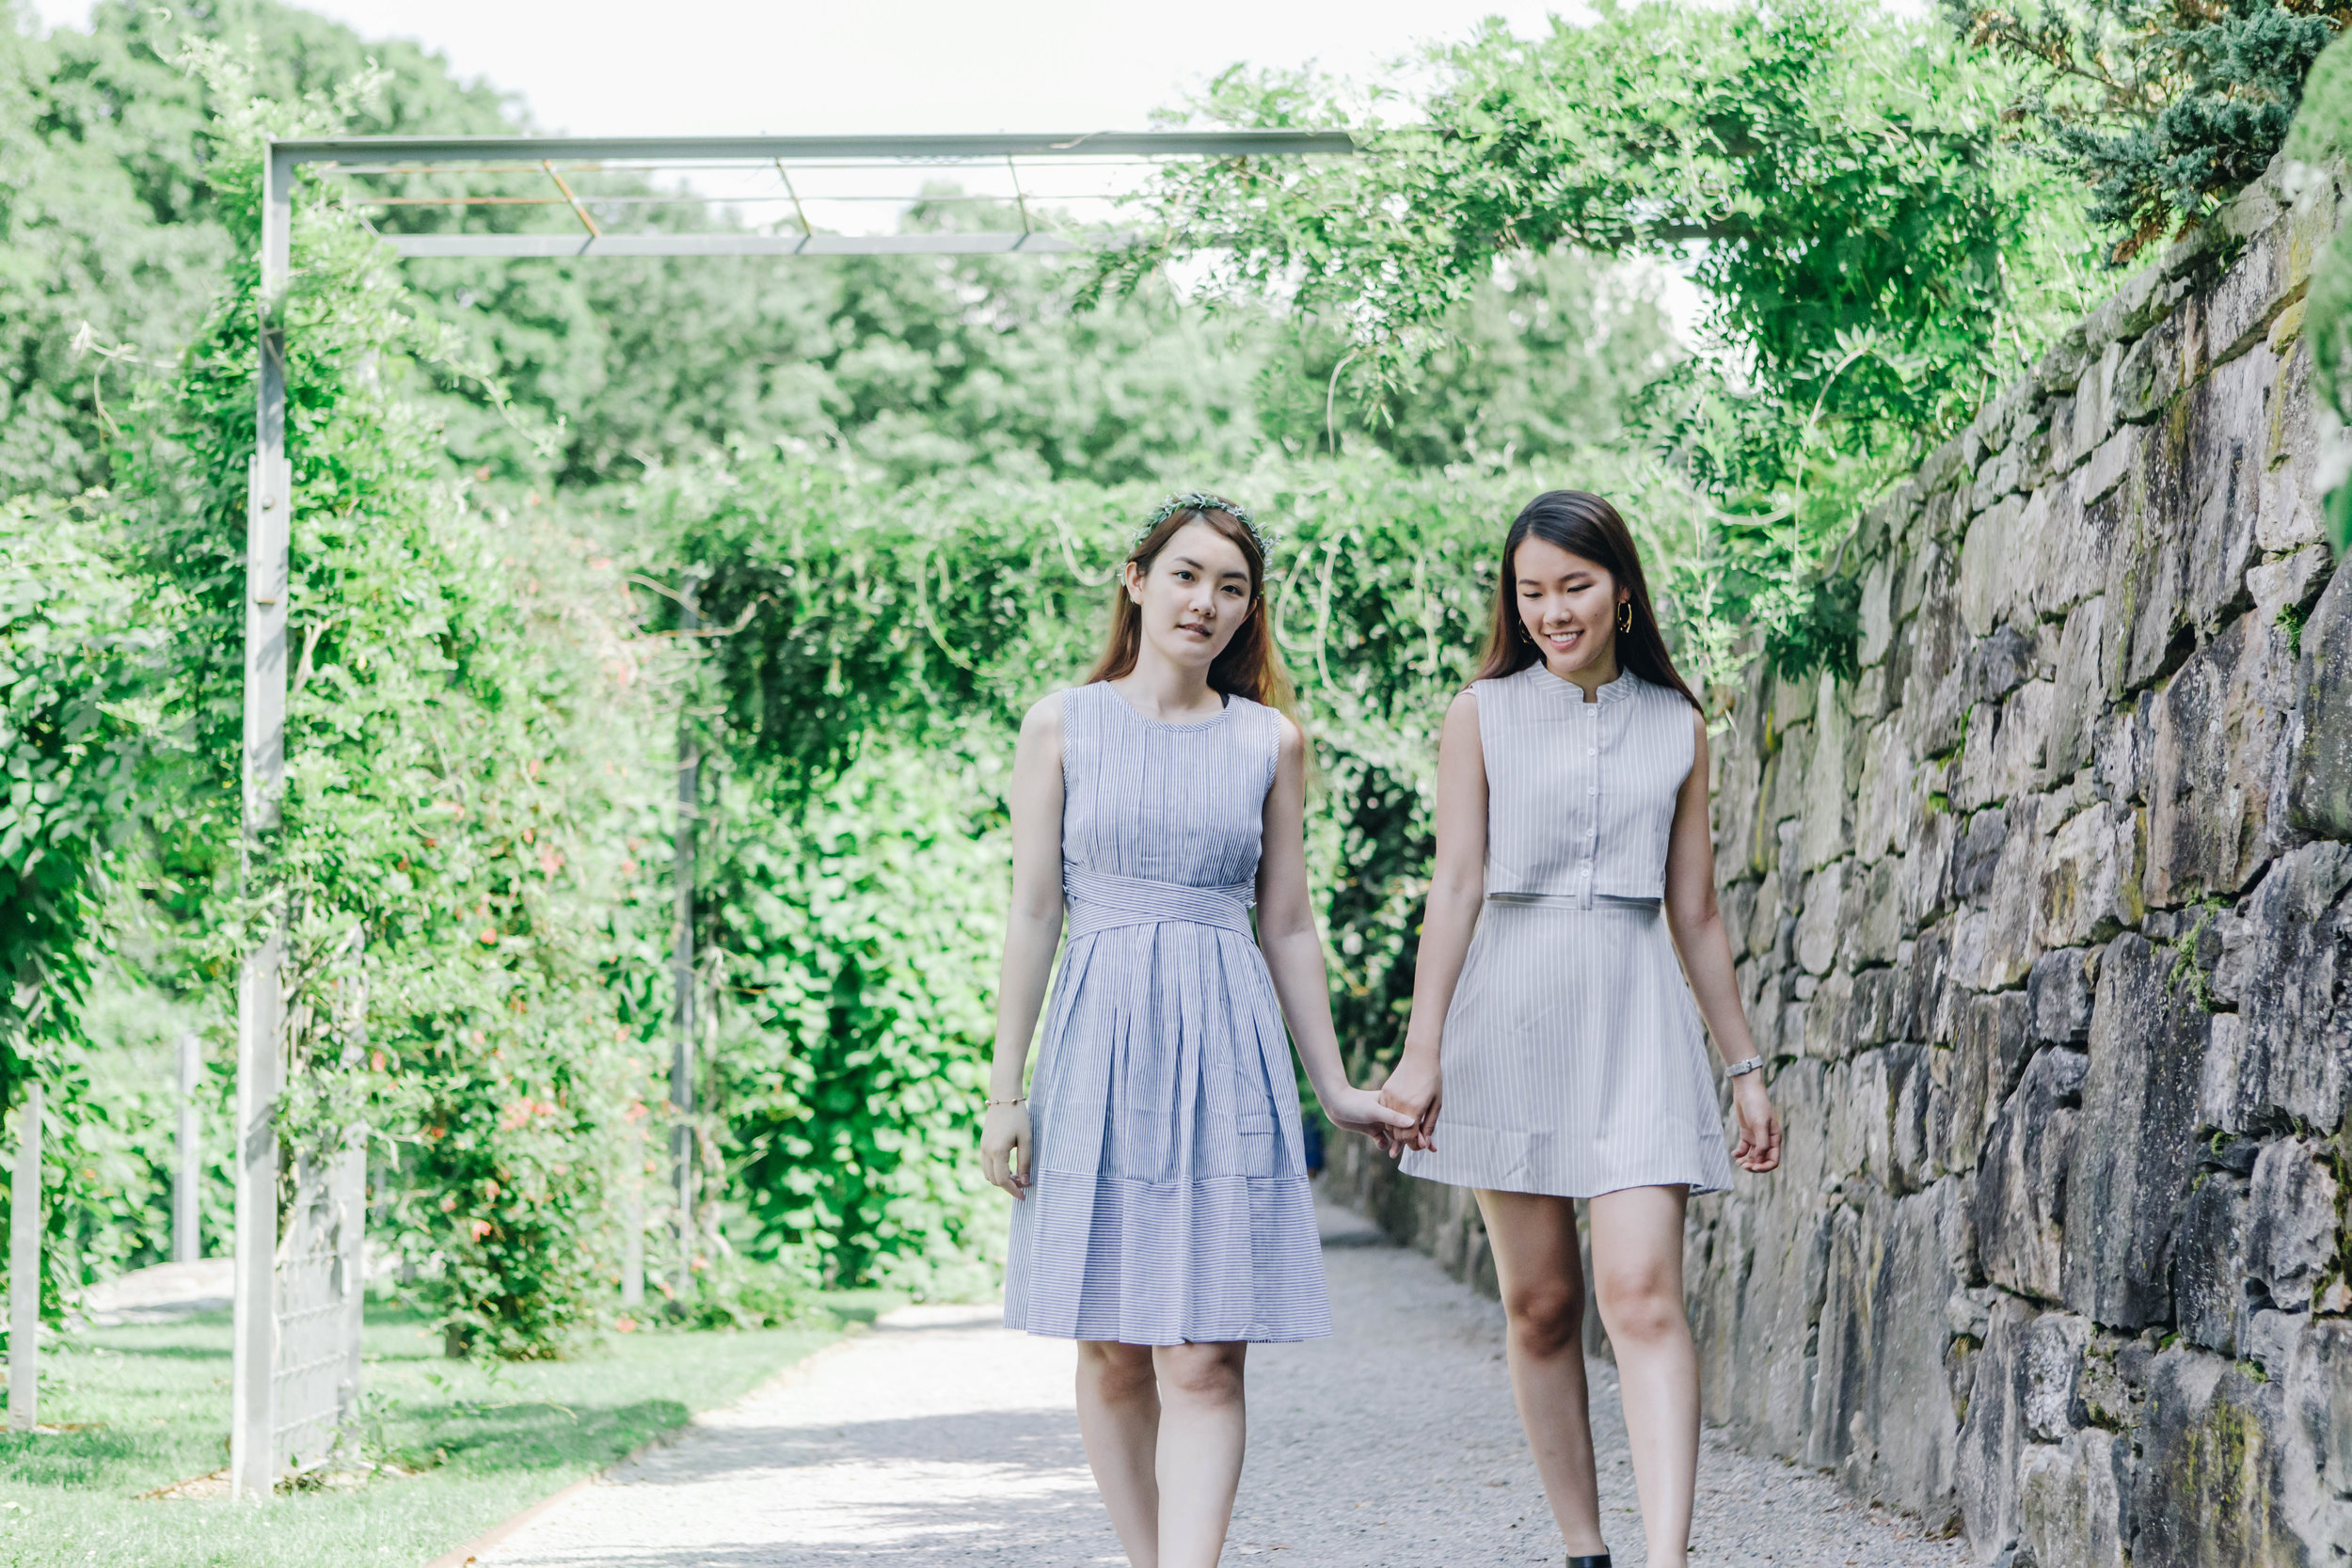 sisters-in-summertime-eva-loh-10.jpg